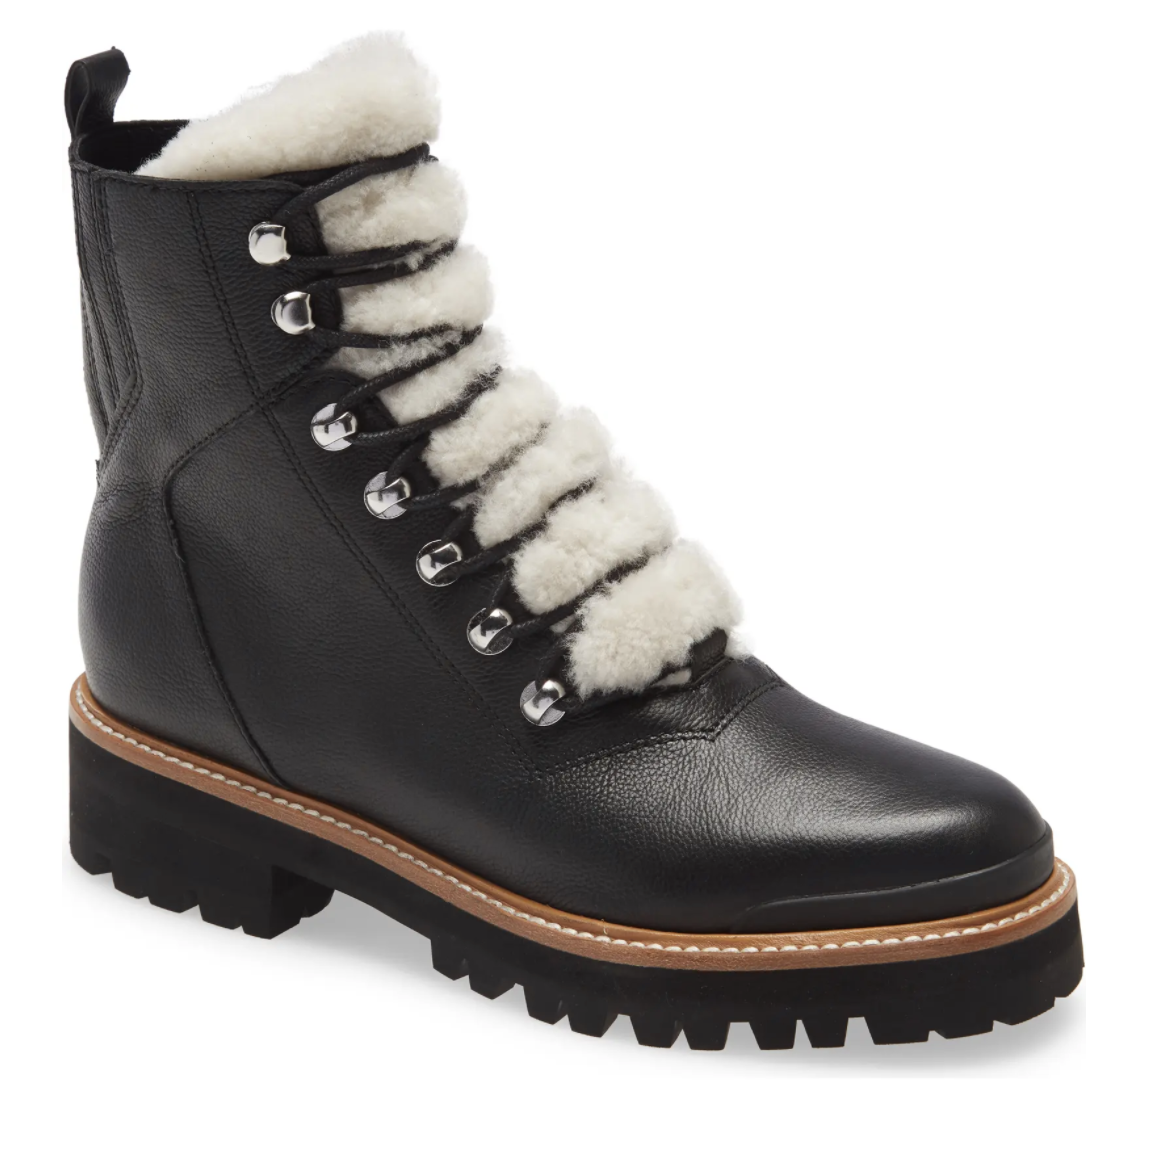 Mark Fischer Boots